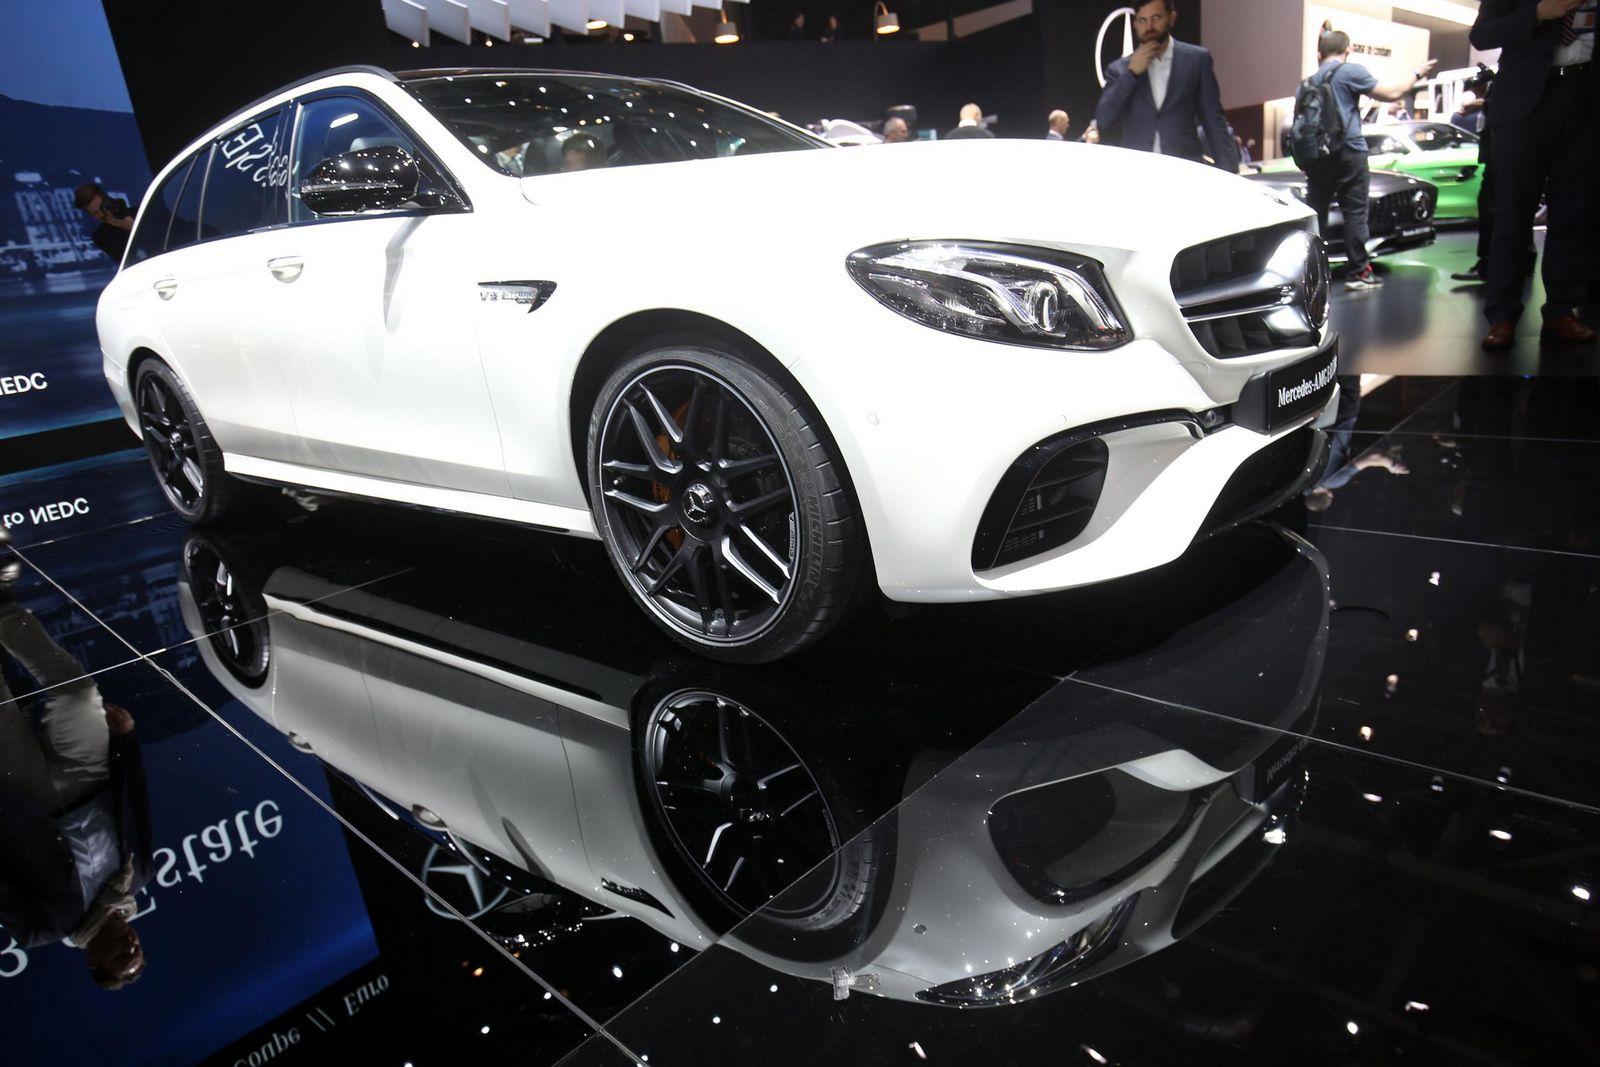 https://2.bp.blogspot.com/-E58ukfyfKt8/WL9hoxlbS9I/AAAAAAAAk0Q/qeV8NVVwecYLTNCjLF-Bk3Hc_bfG04UNQCLcB/s1600/Mercedes-AMG%2BE63%2BEstate%2B-2.jpg